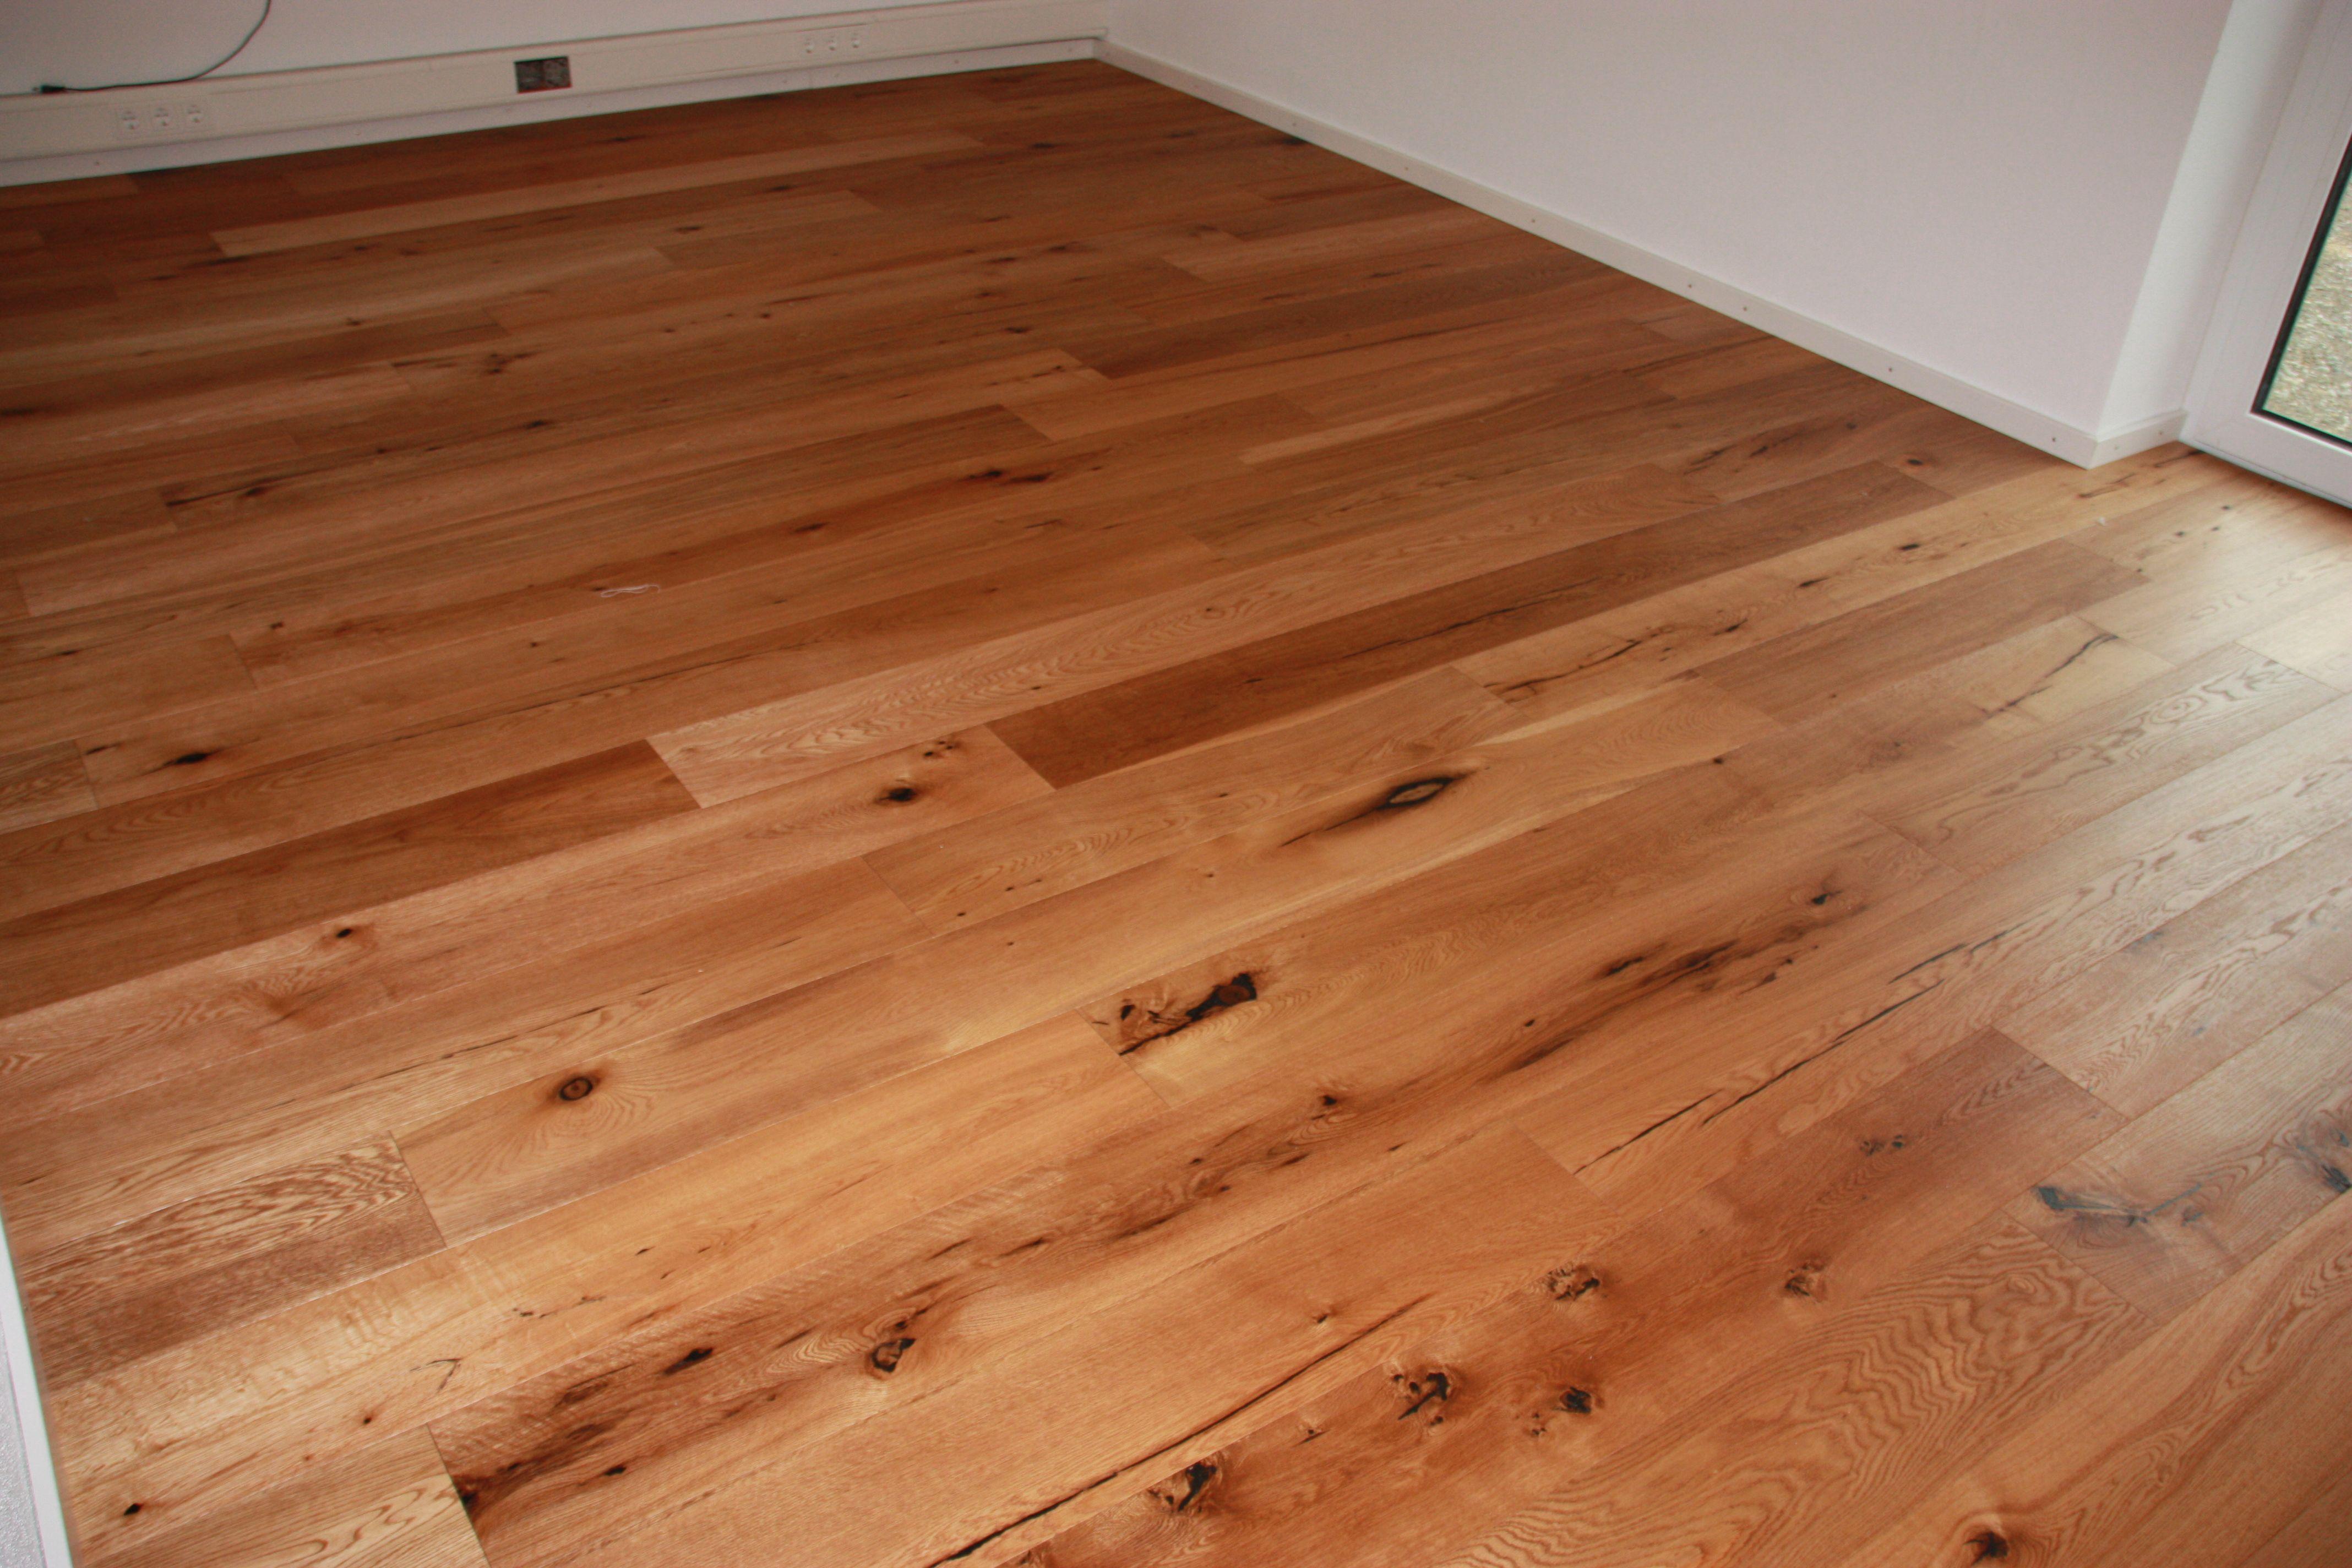 eiche massiv platte 15mm m belbauplatte massivholz kernesche dl fsc 19 x diverse l ngen x 1210 mm. Black Bedroom Furniture Sets. Home Design Ideas